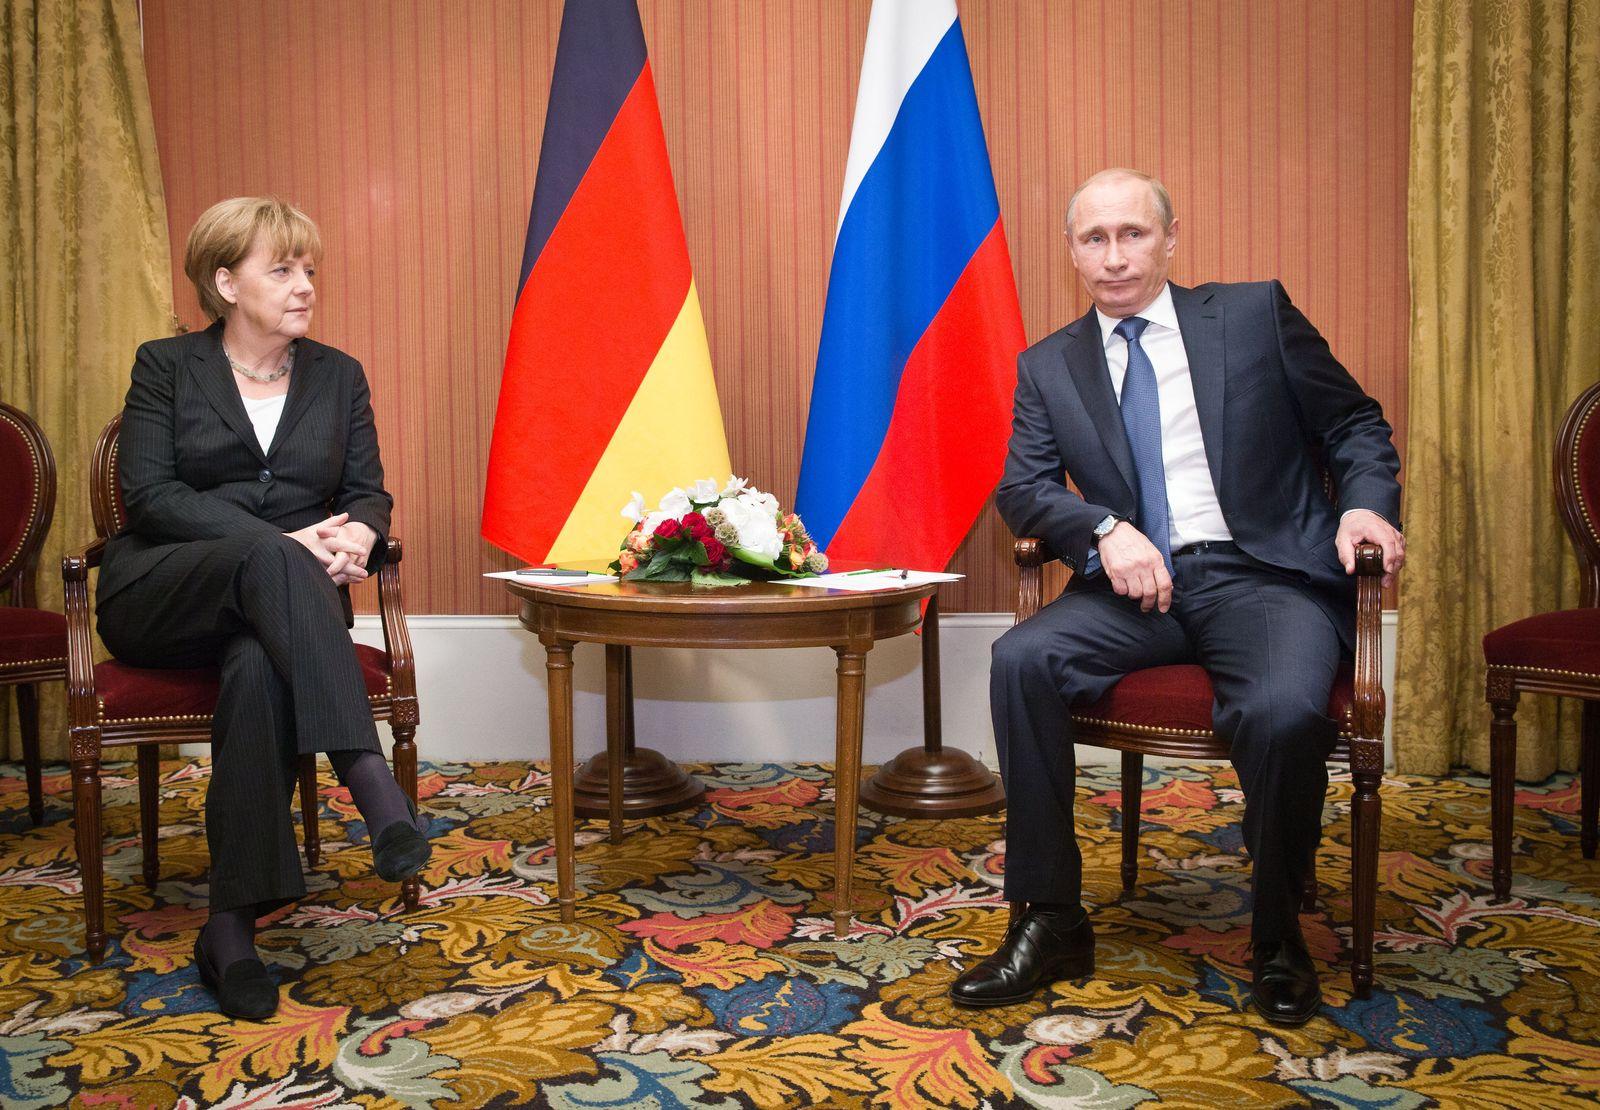 Putin/ Merkel/ D-Day